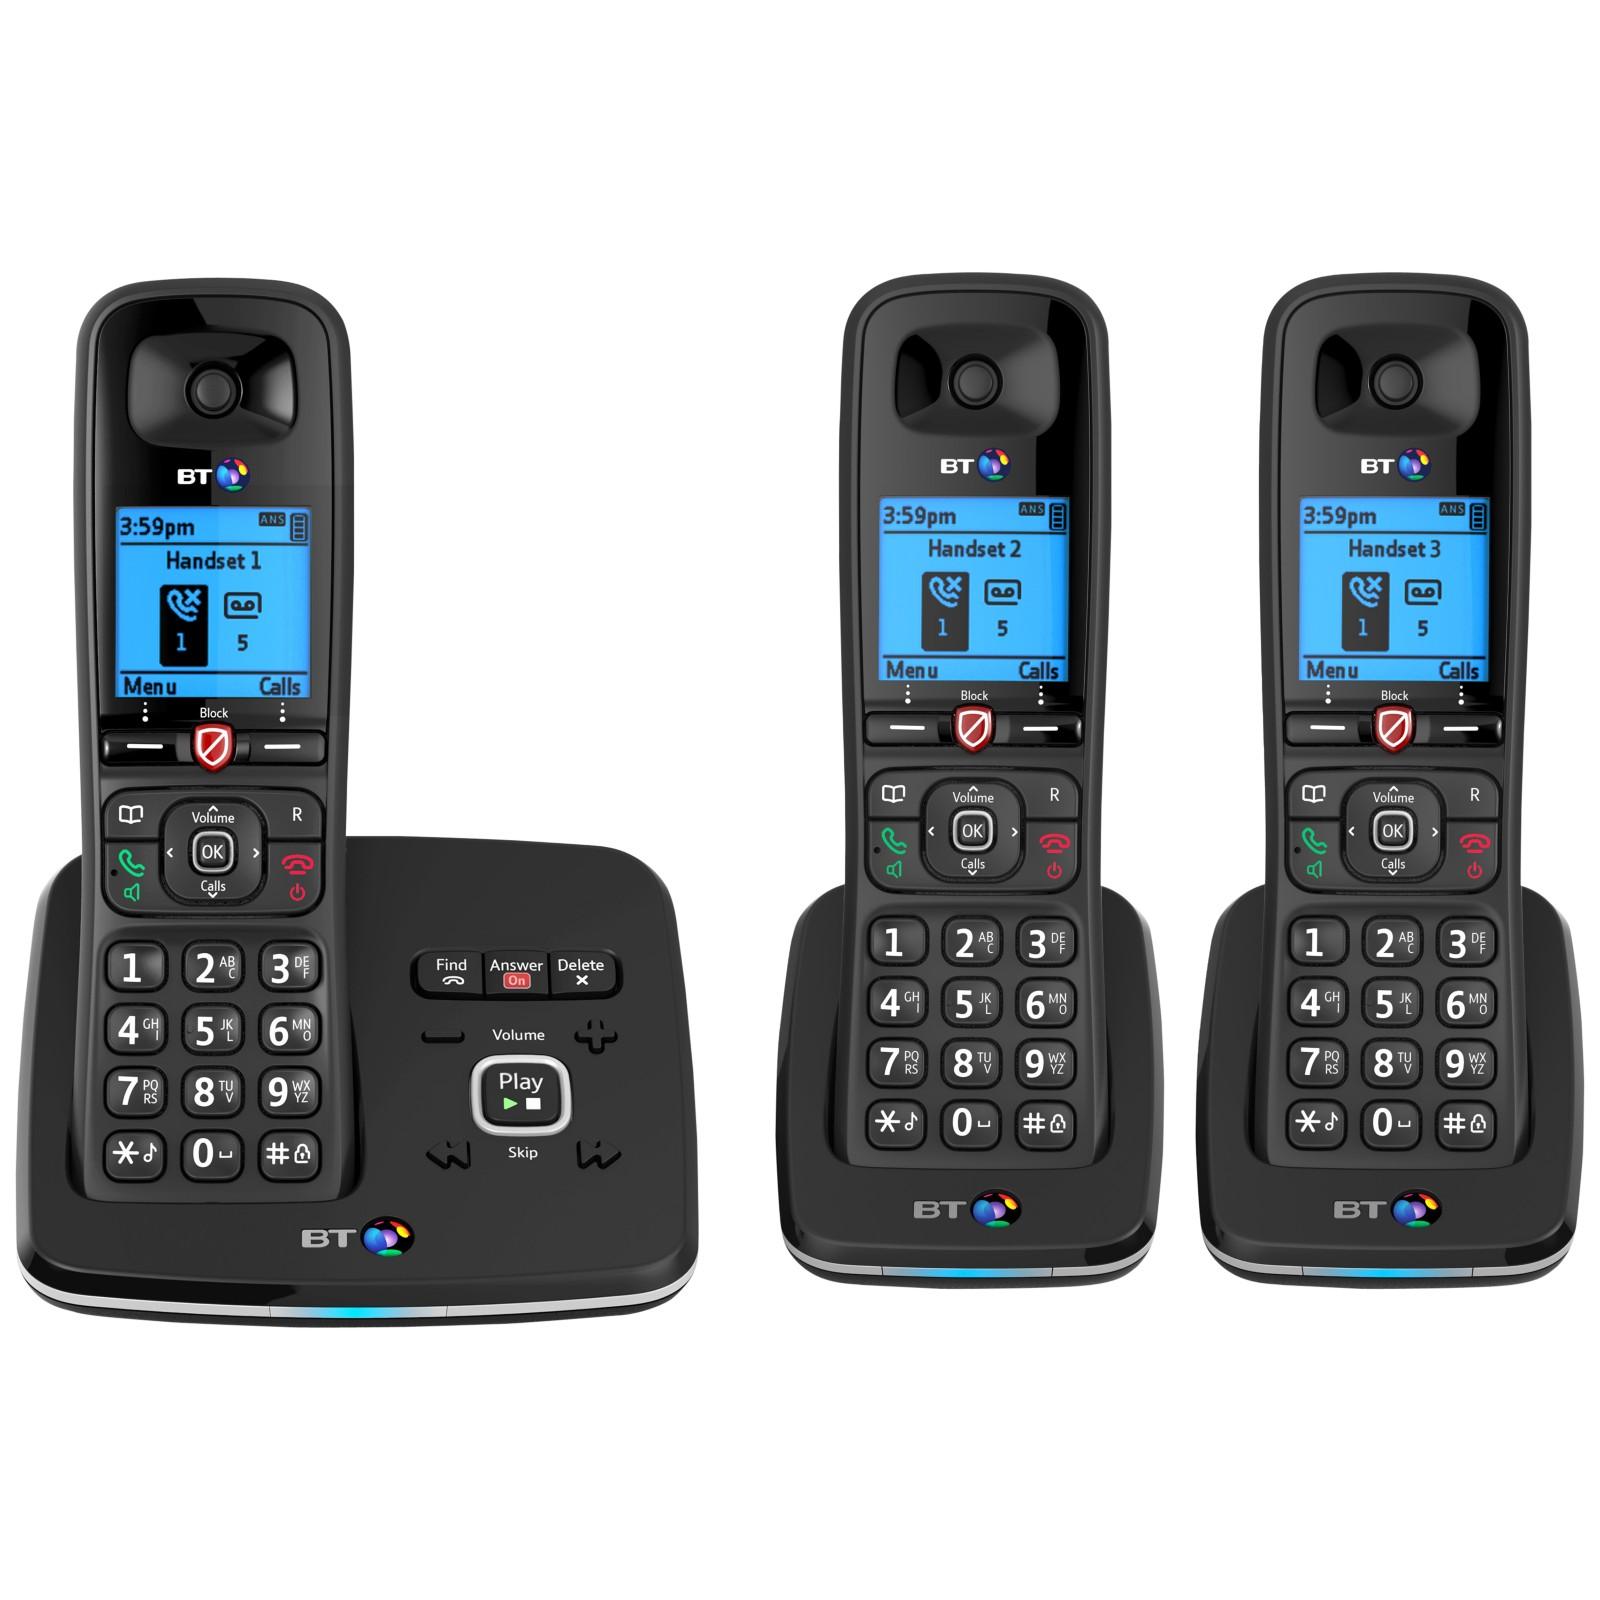 BT 6610 Digital Cordless Phone With Nuisance Call Blocking & Answering Machine